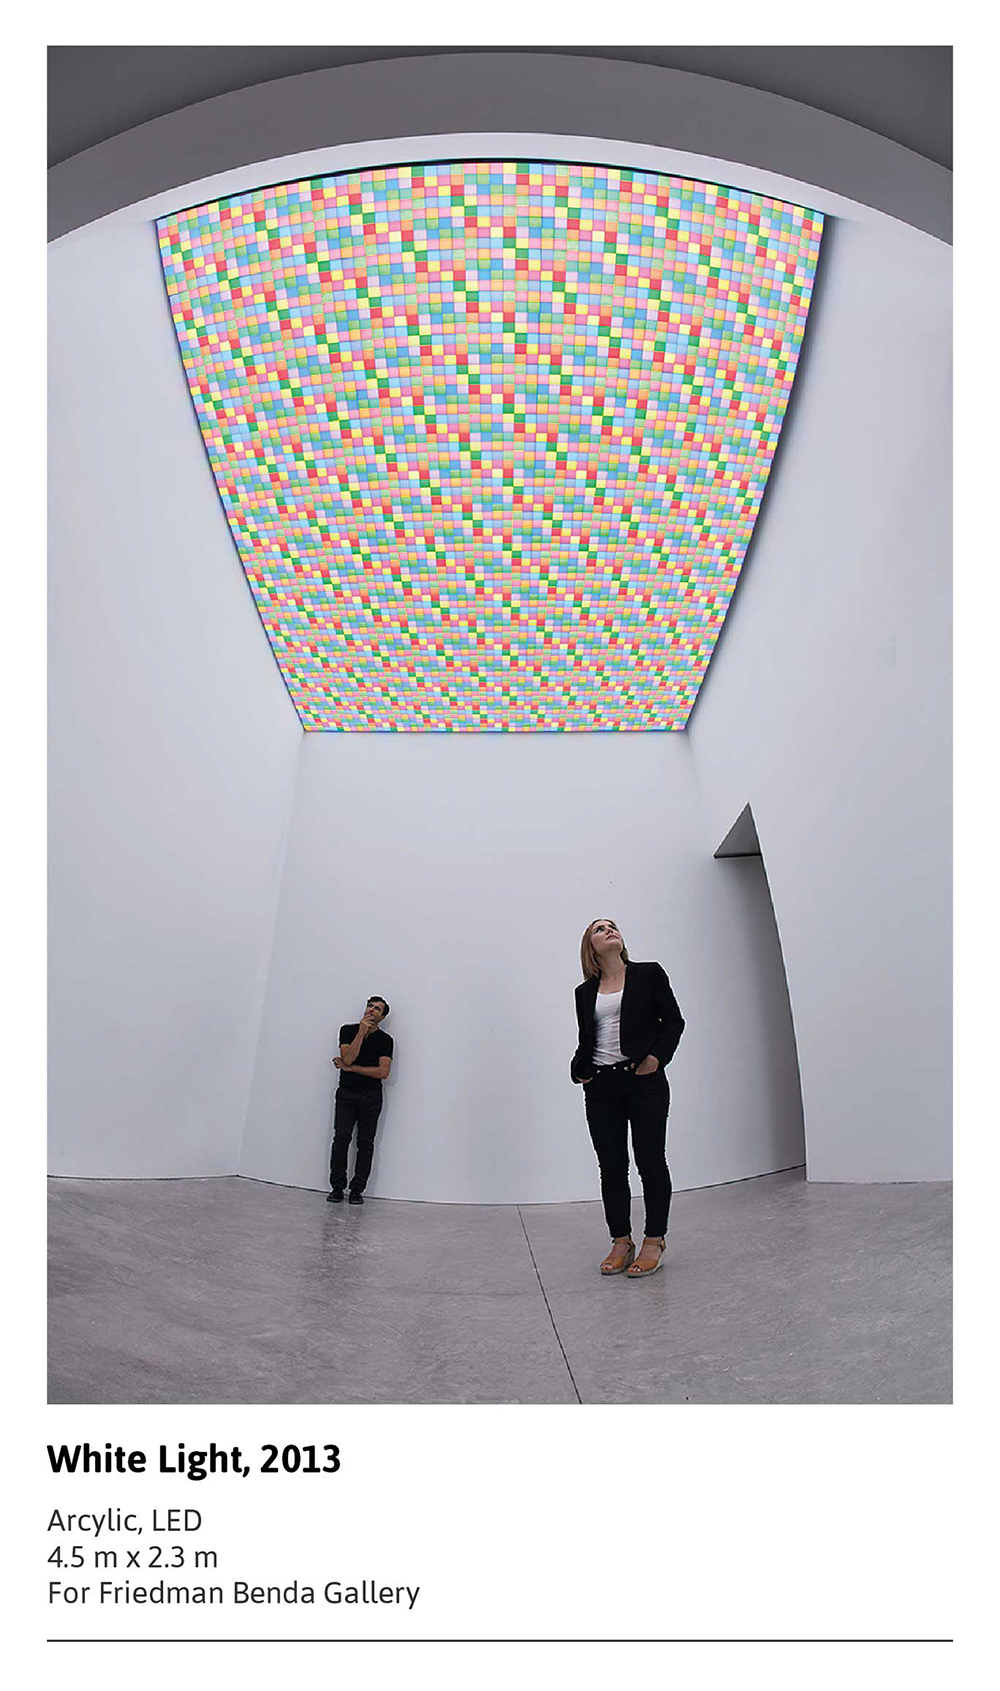 6f6dd73ea970 WHITE LIGHT — PAUL COCKSEDGE STUDIO